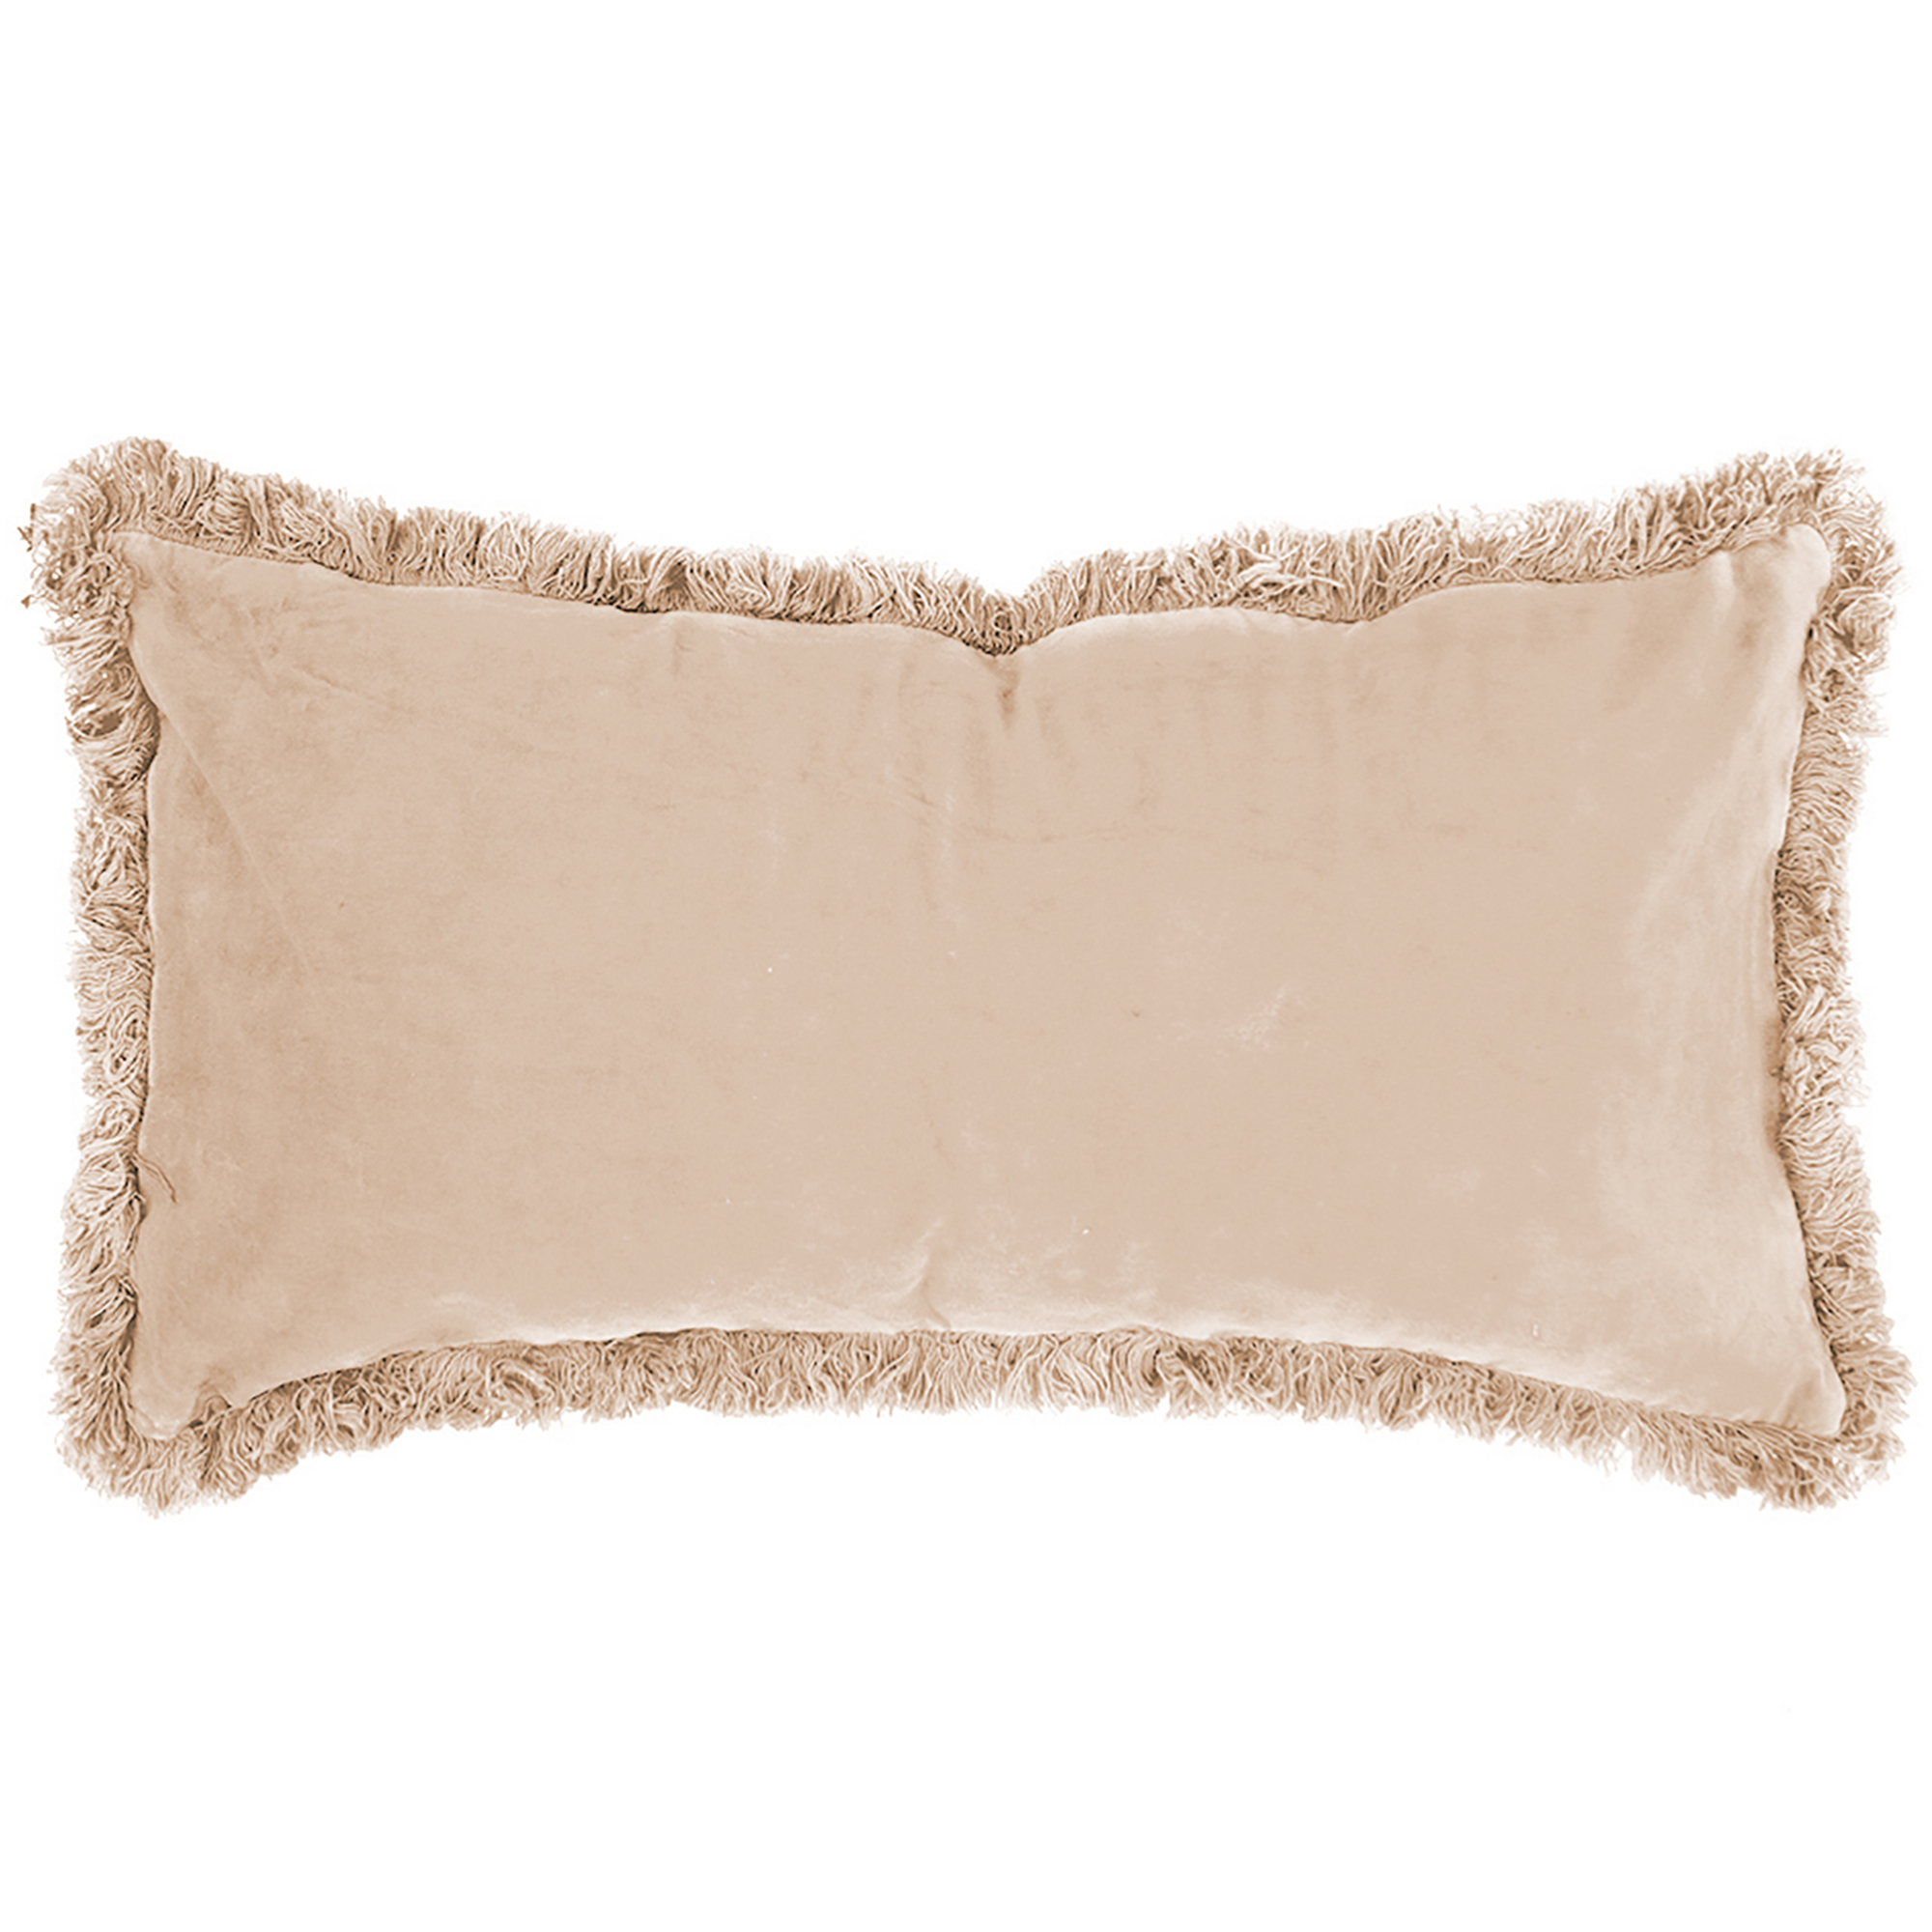 Details About New Rectangular Velvet Feather Filled Cushion Bambury Cushions